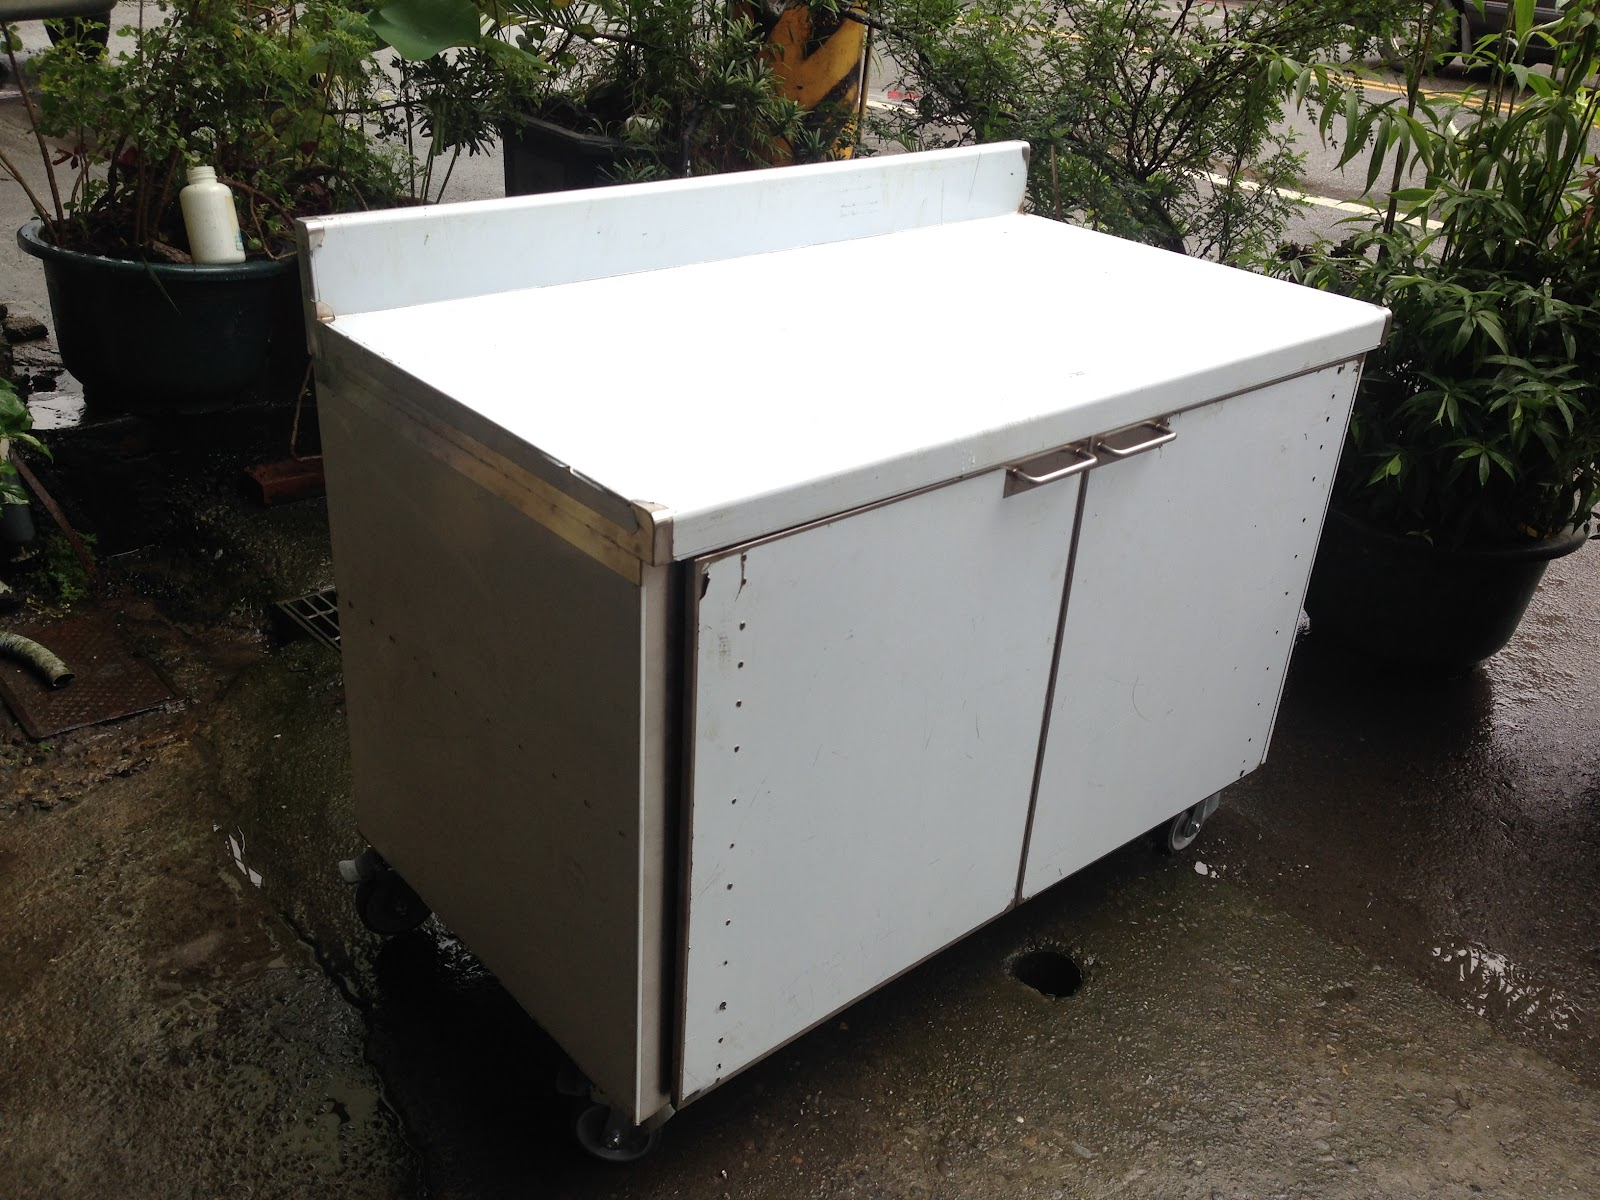 60 40 kitchen sink small renovation 國筌工業社: 家用流理台、洗手台、洗衣水槽、瓦斯爐台、厨房流理台